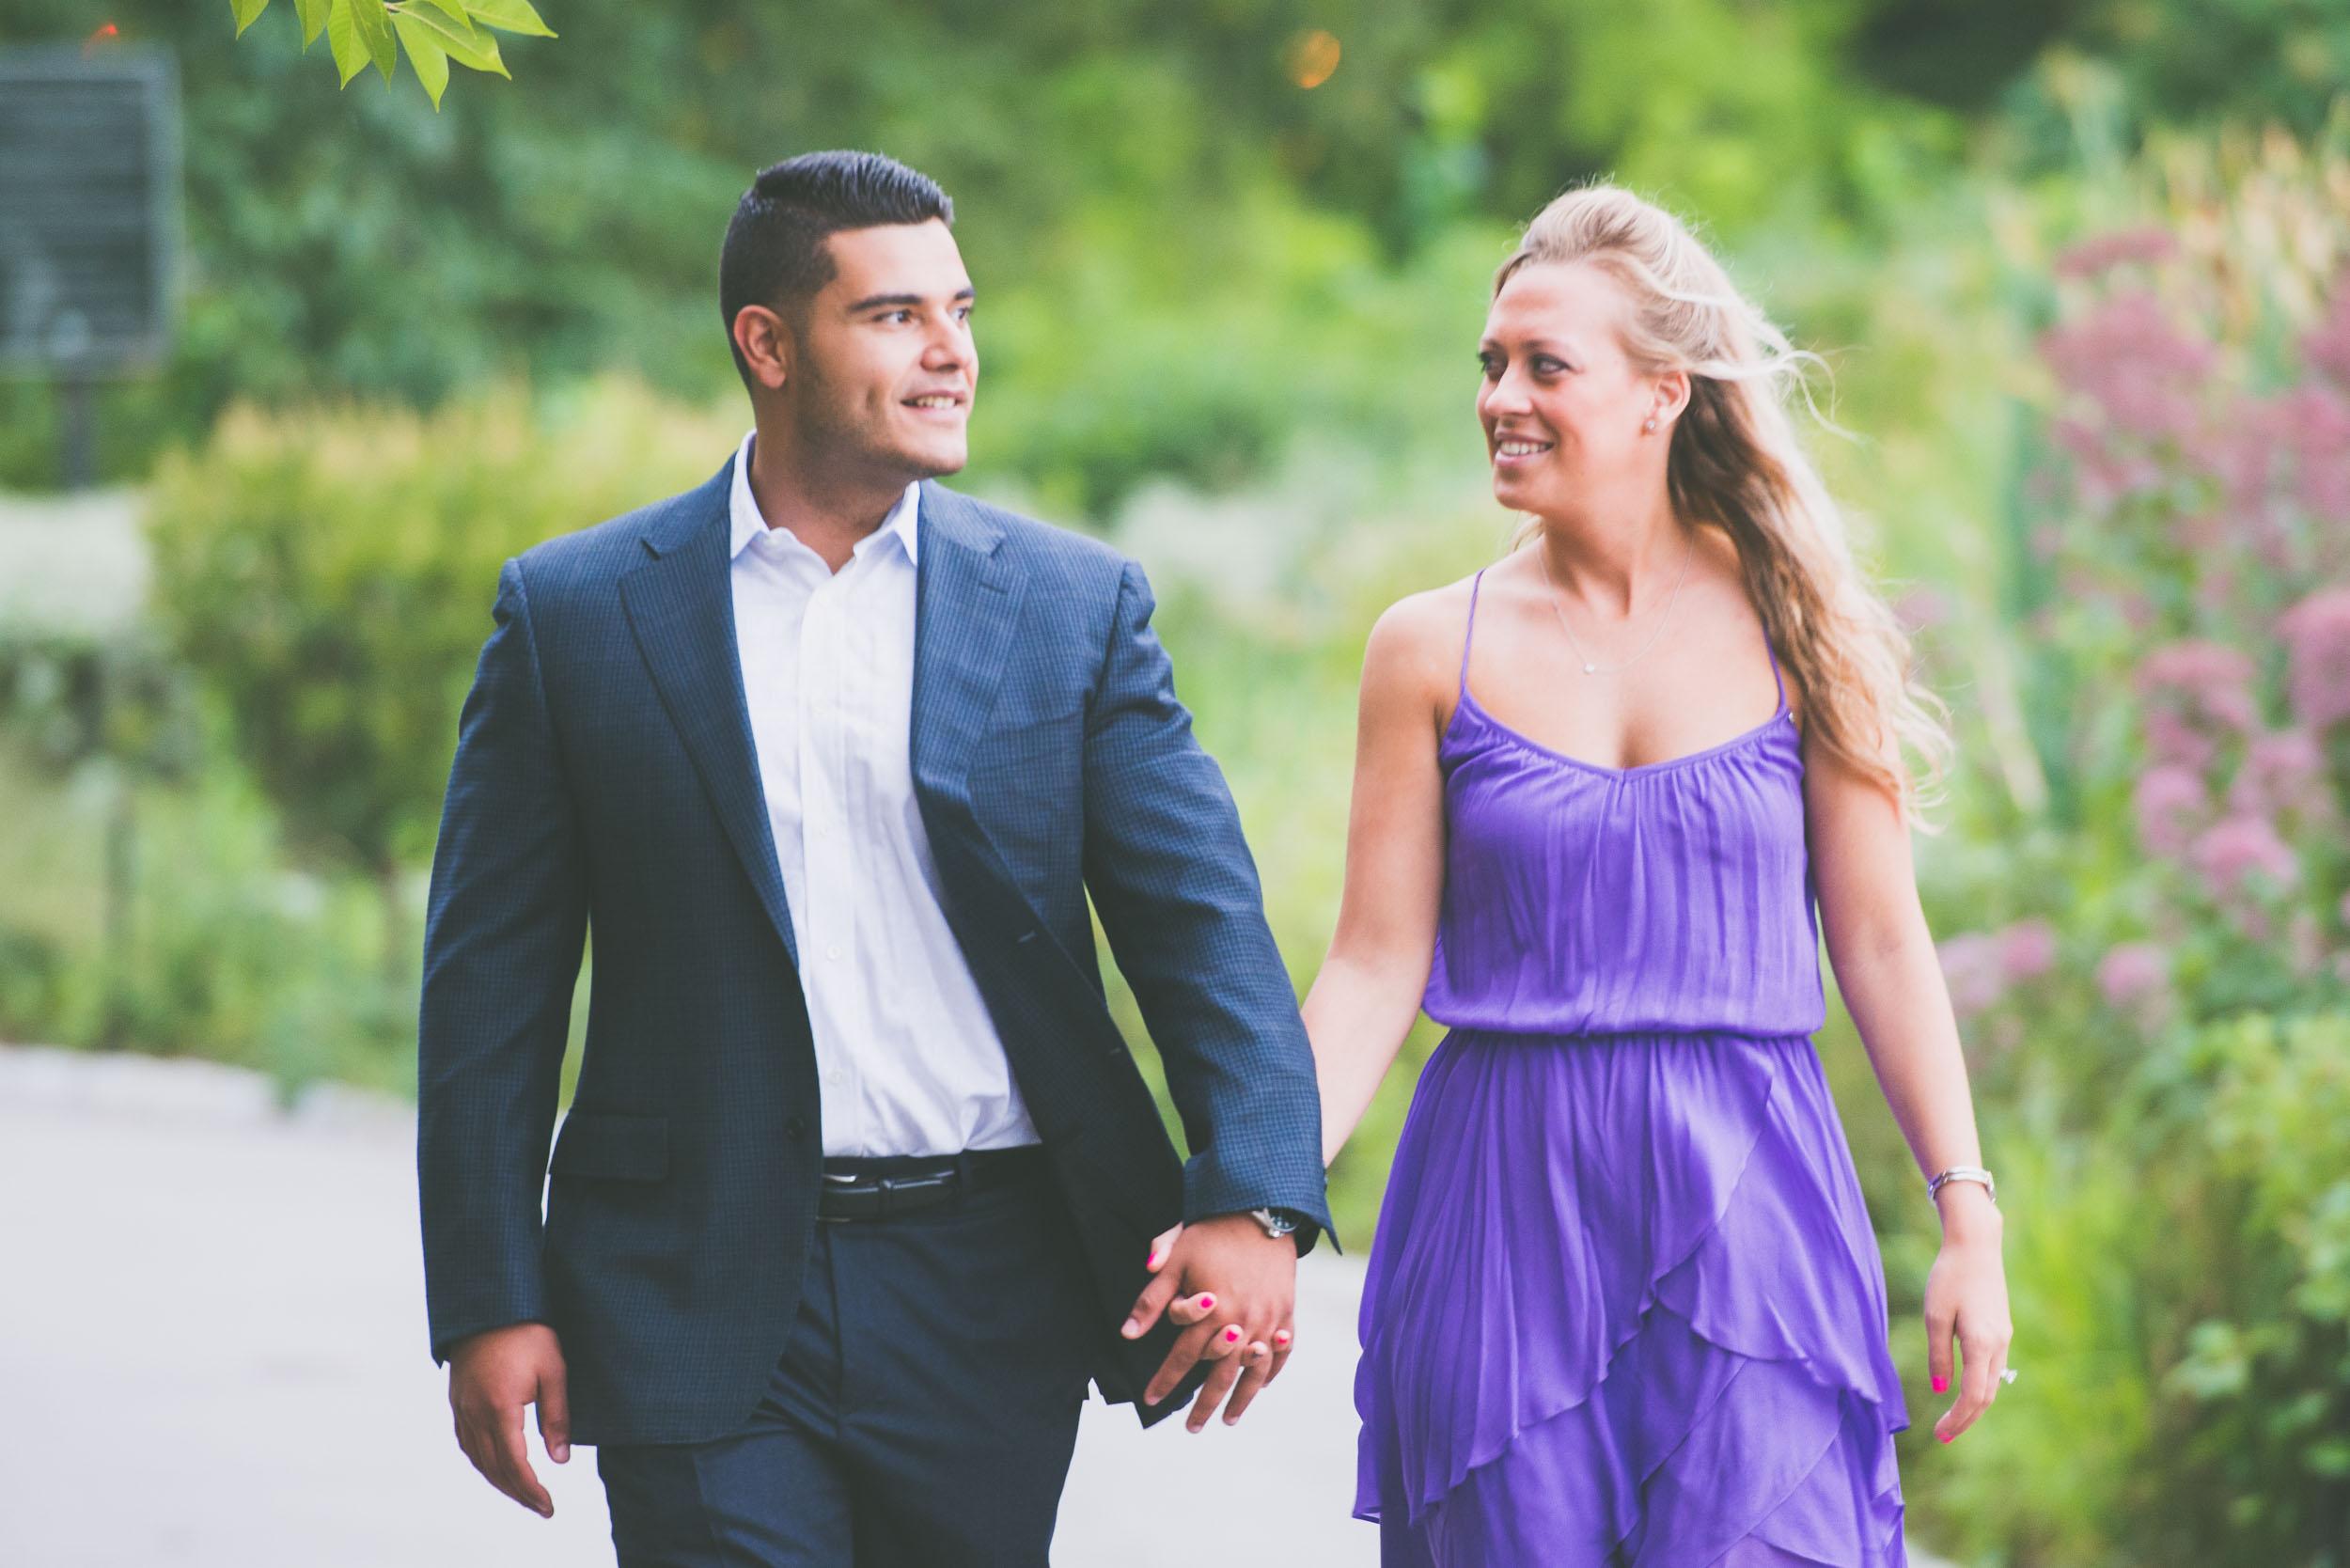 Couple walking through gardens - Engagement Portraits - Photo credit Nicola Bailey.jpg